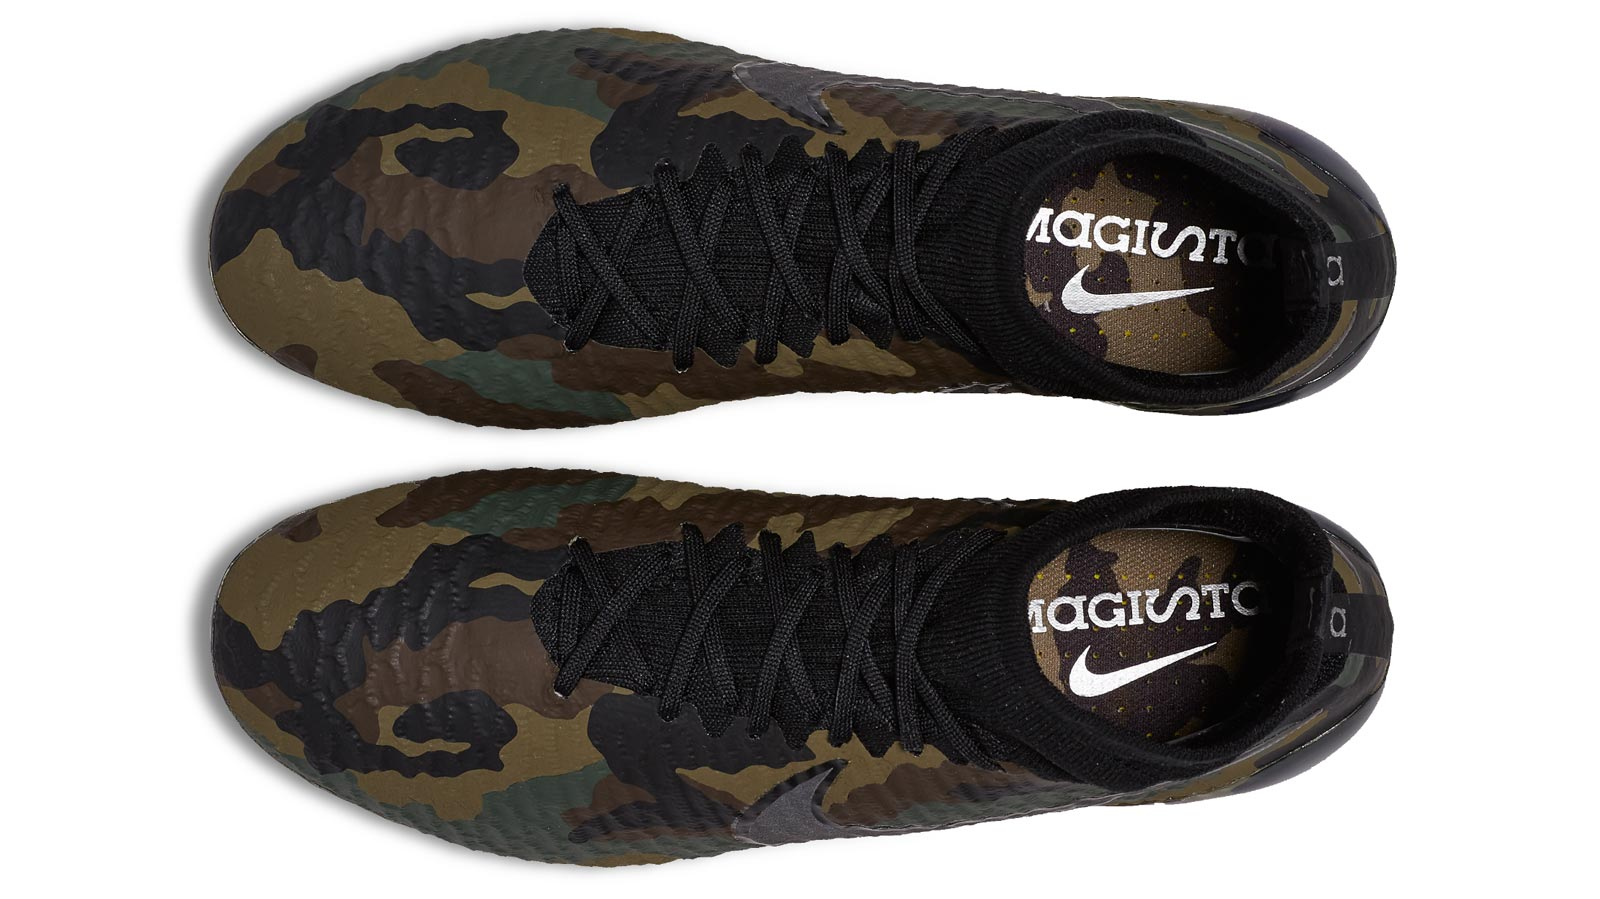 Nike Magista Obra Camo 2016